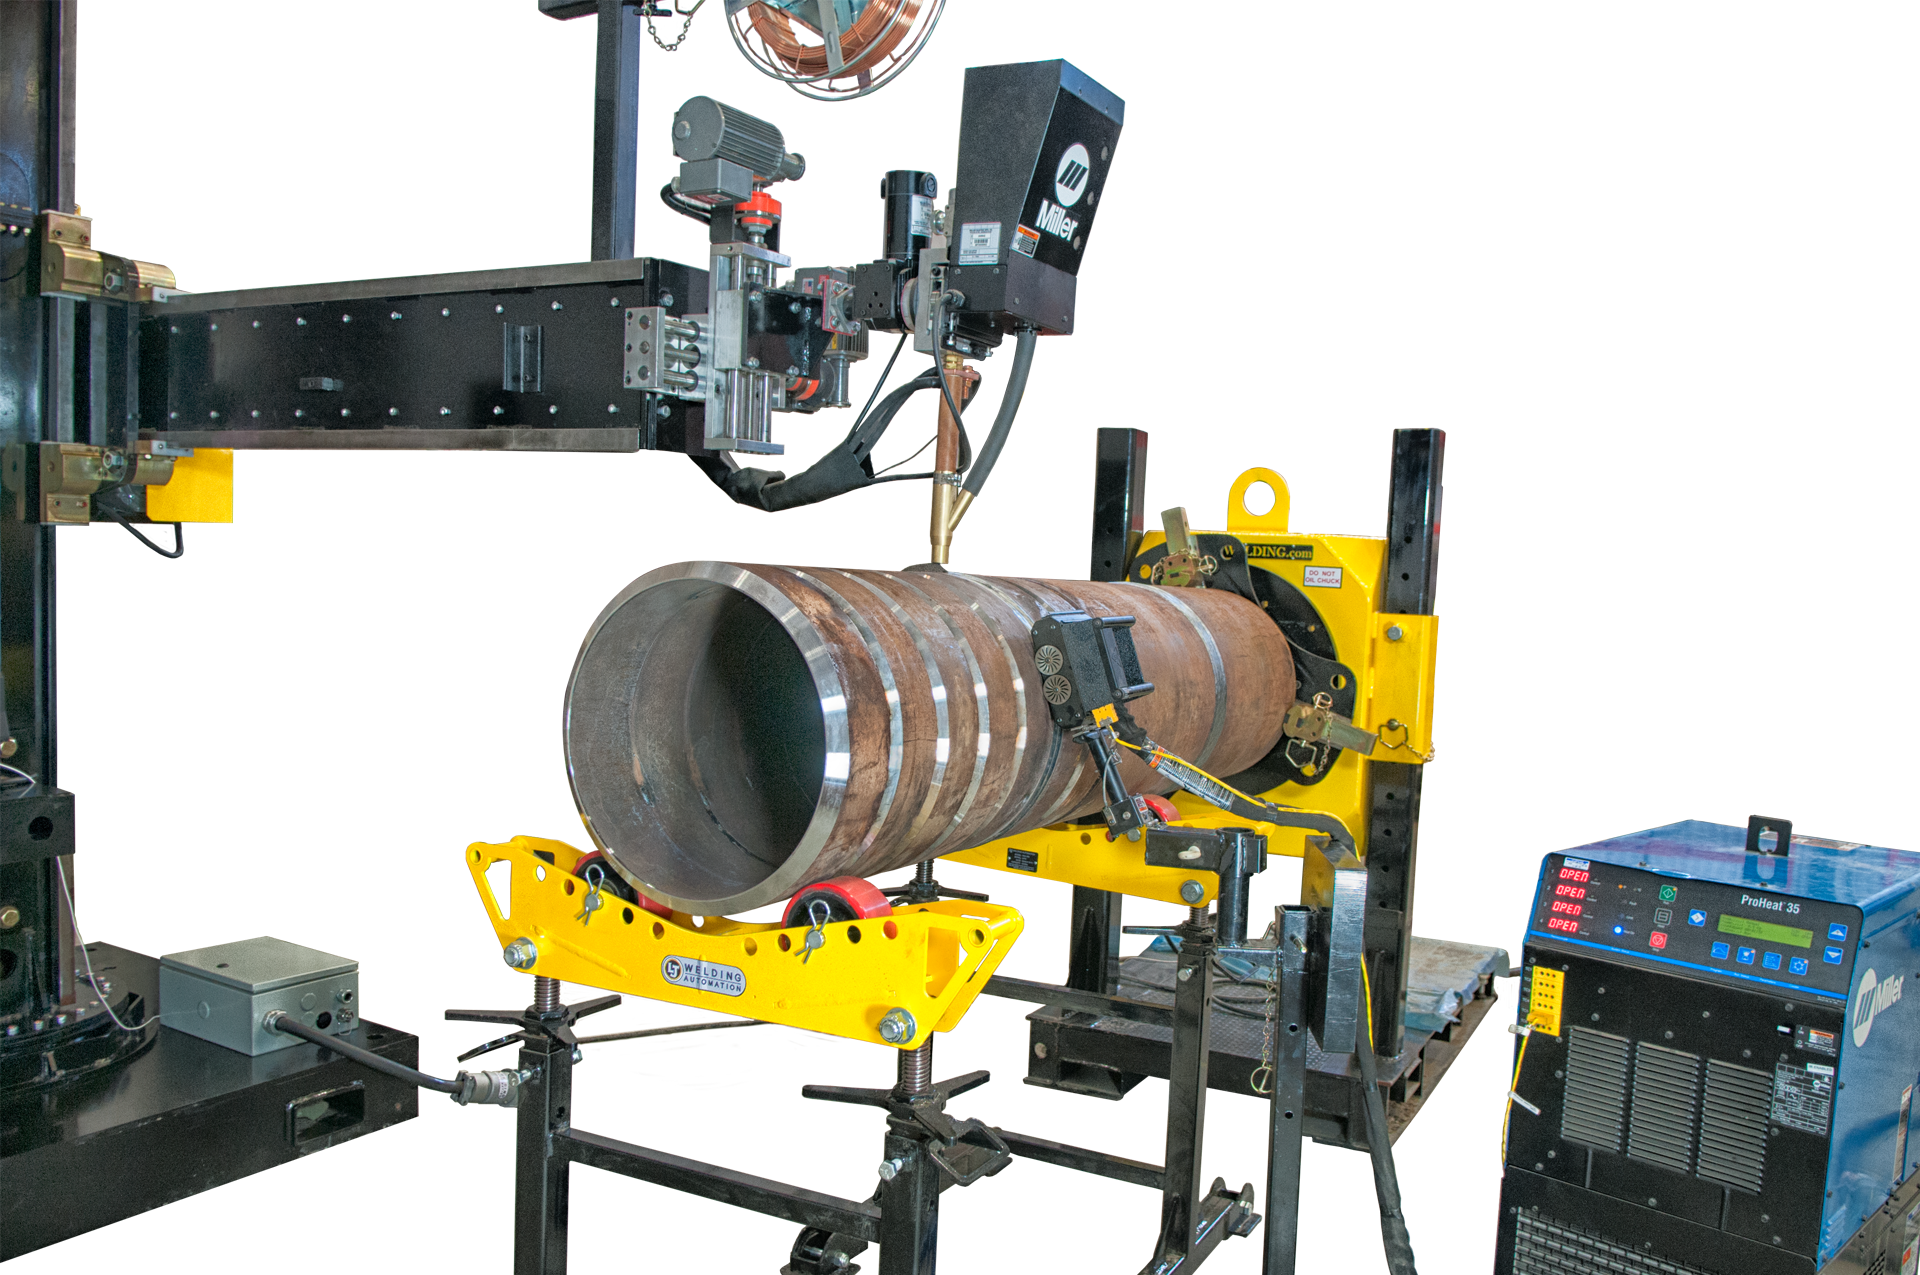 12_x-12-welding-manipulator-mn12-200.png